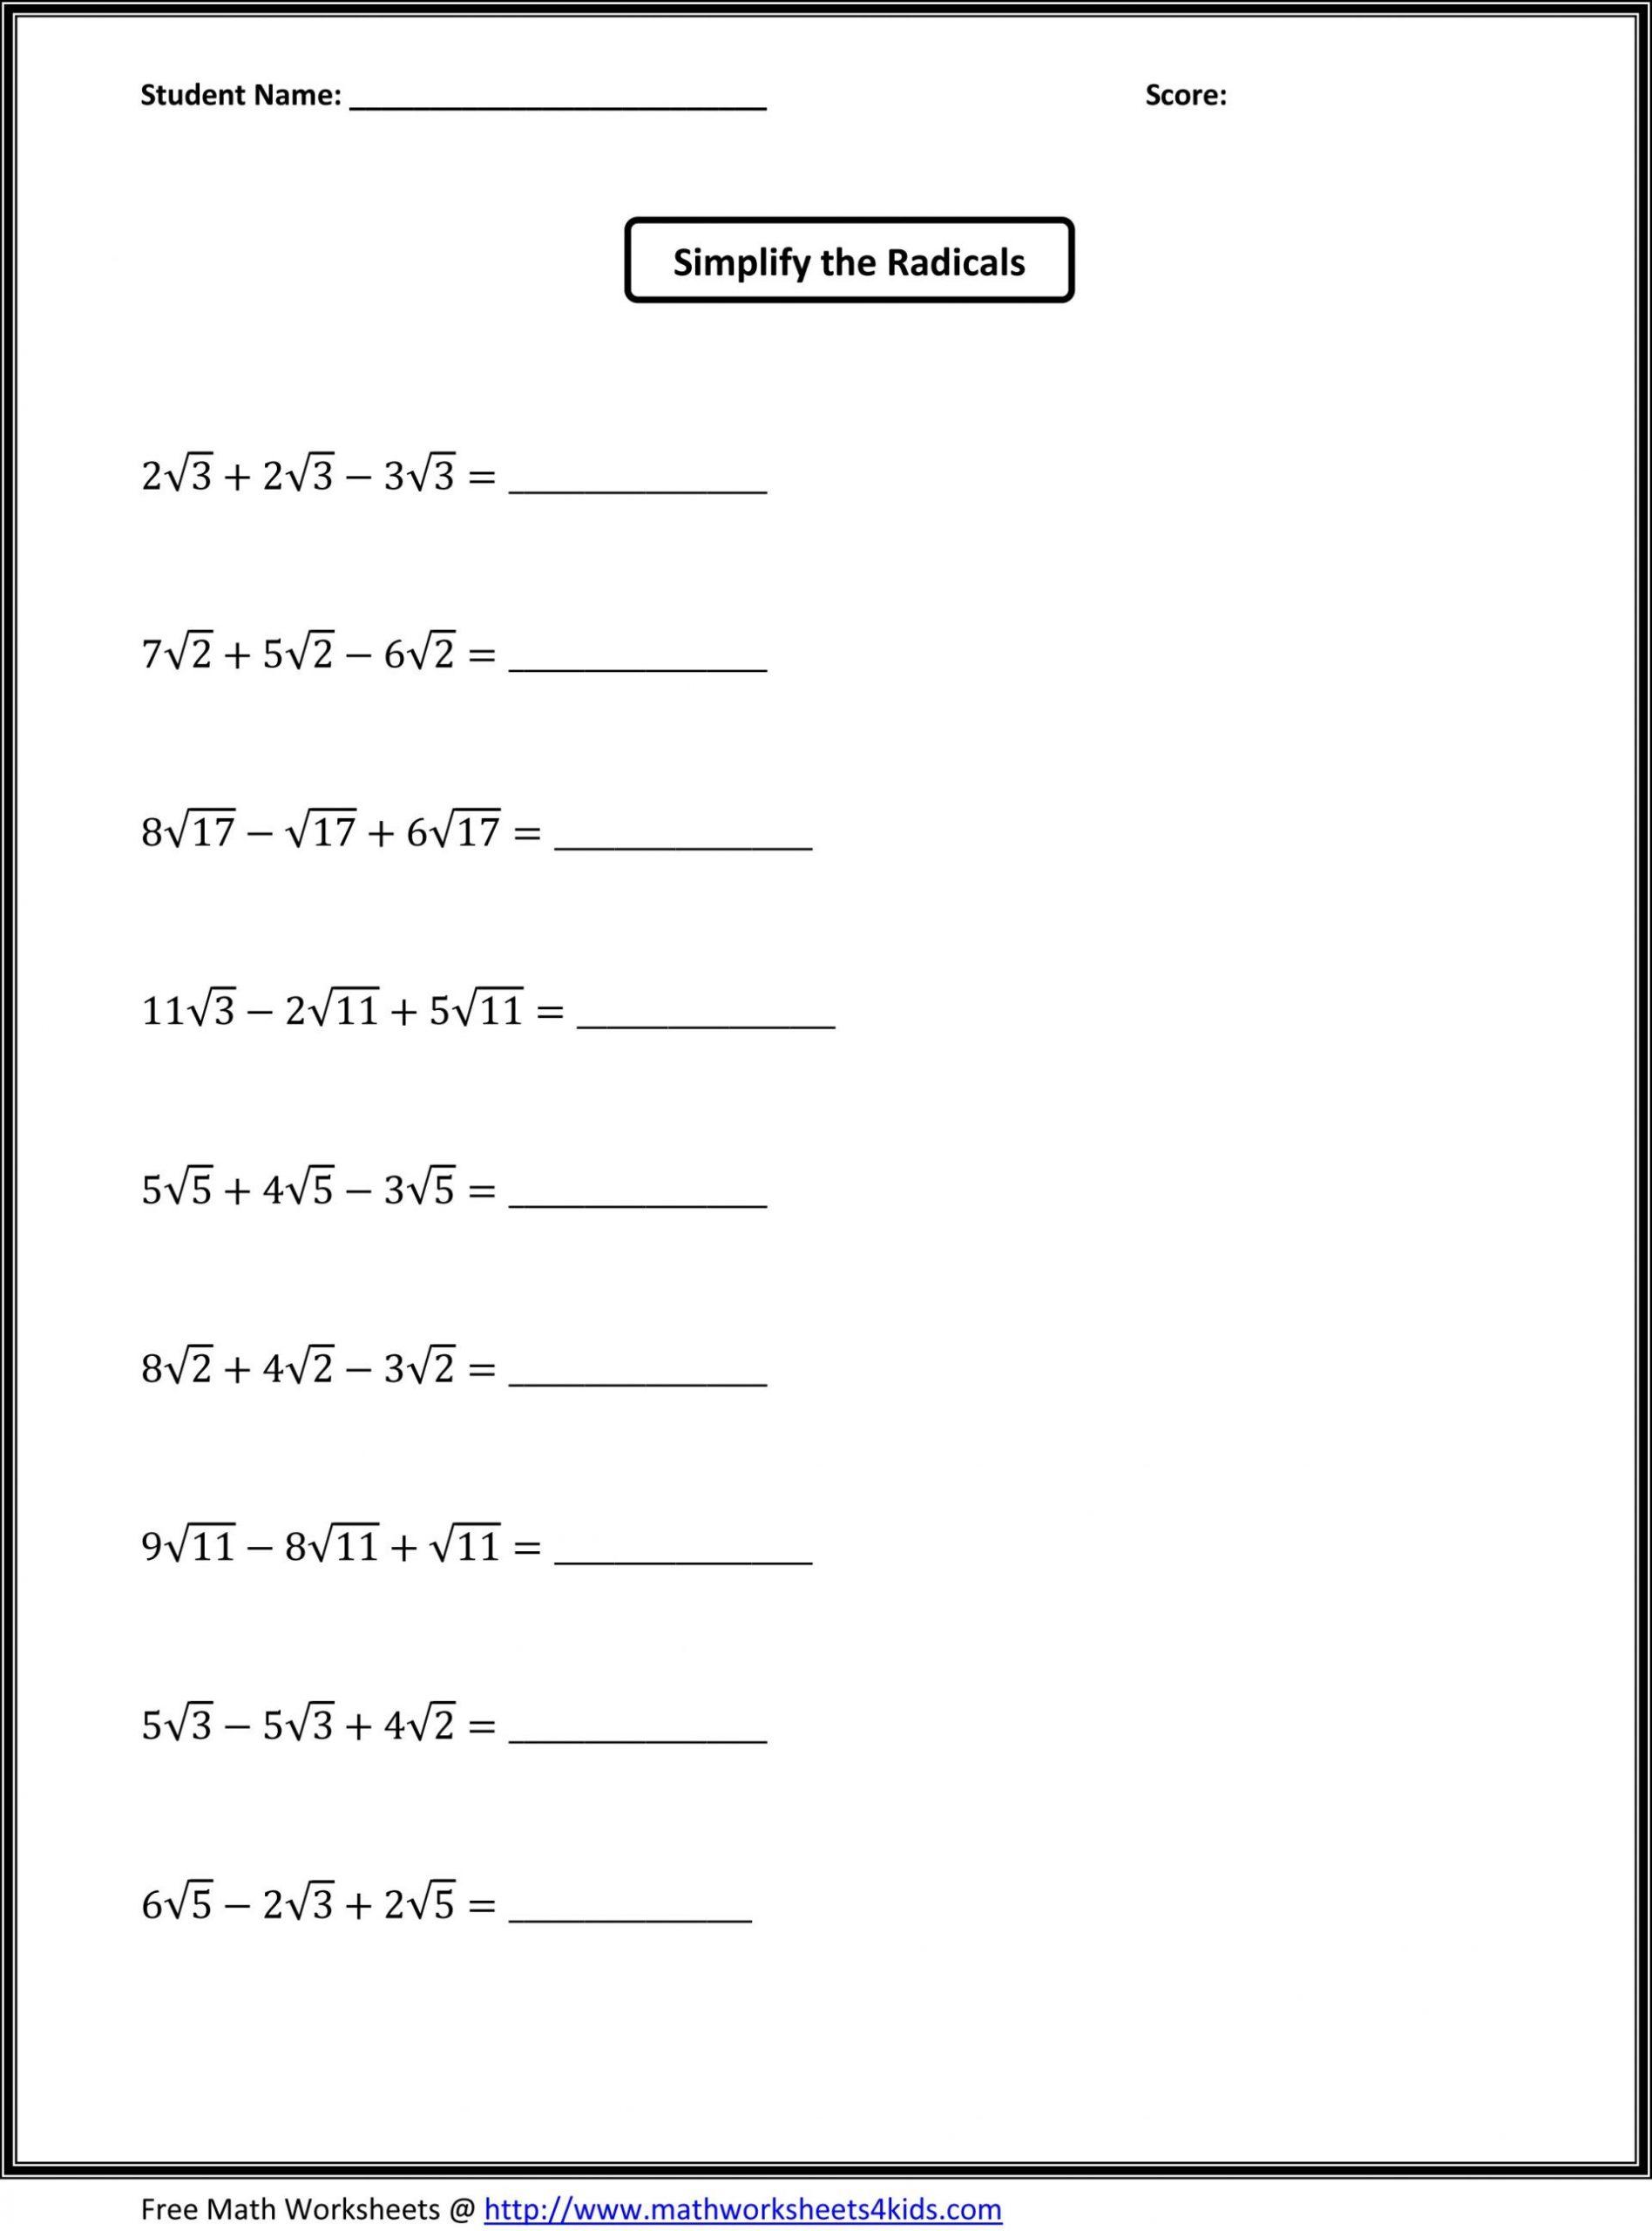 Simple Probability Worksheet Pdf 7th Grade Math Worksheets Pdf